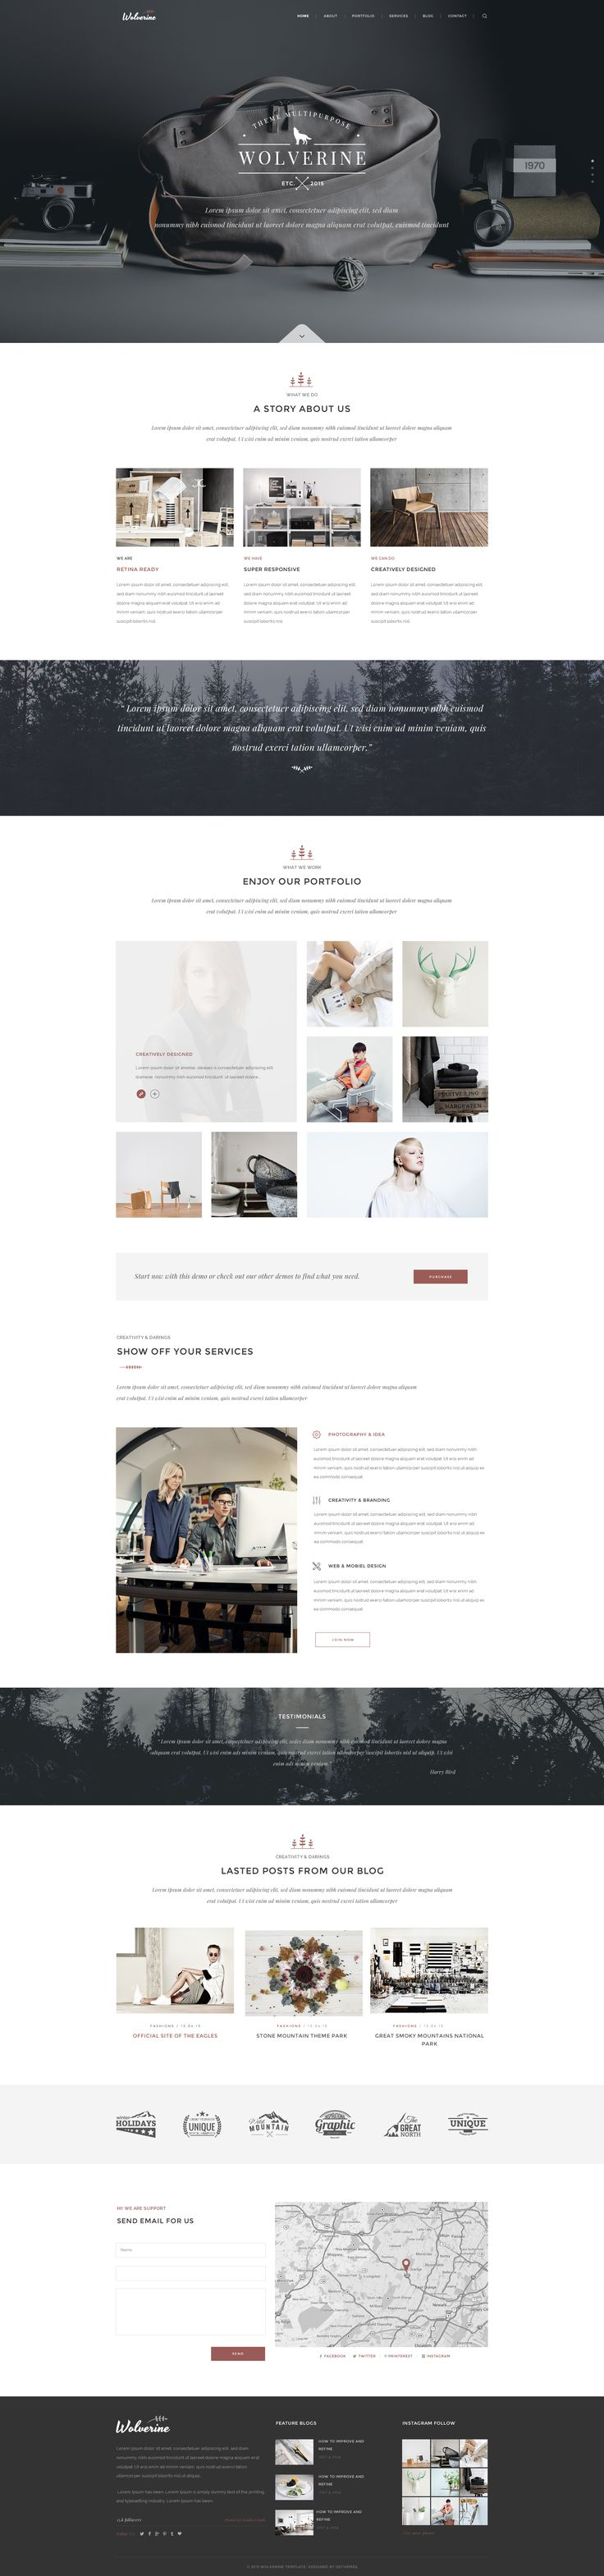 576 best web design images on pinterest web layout website layout